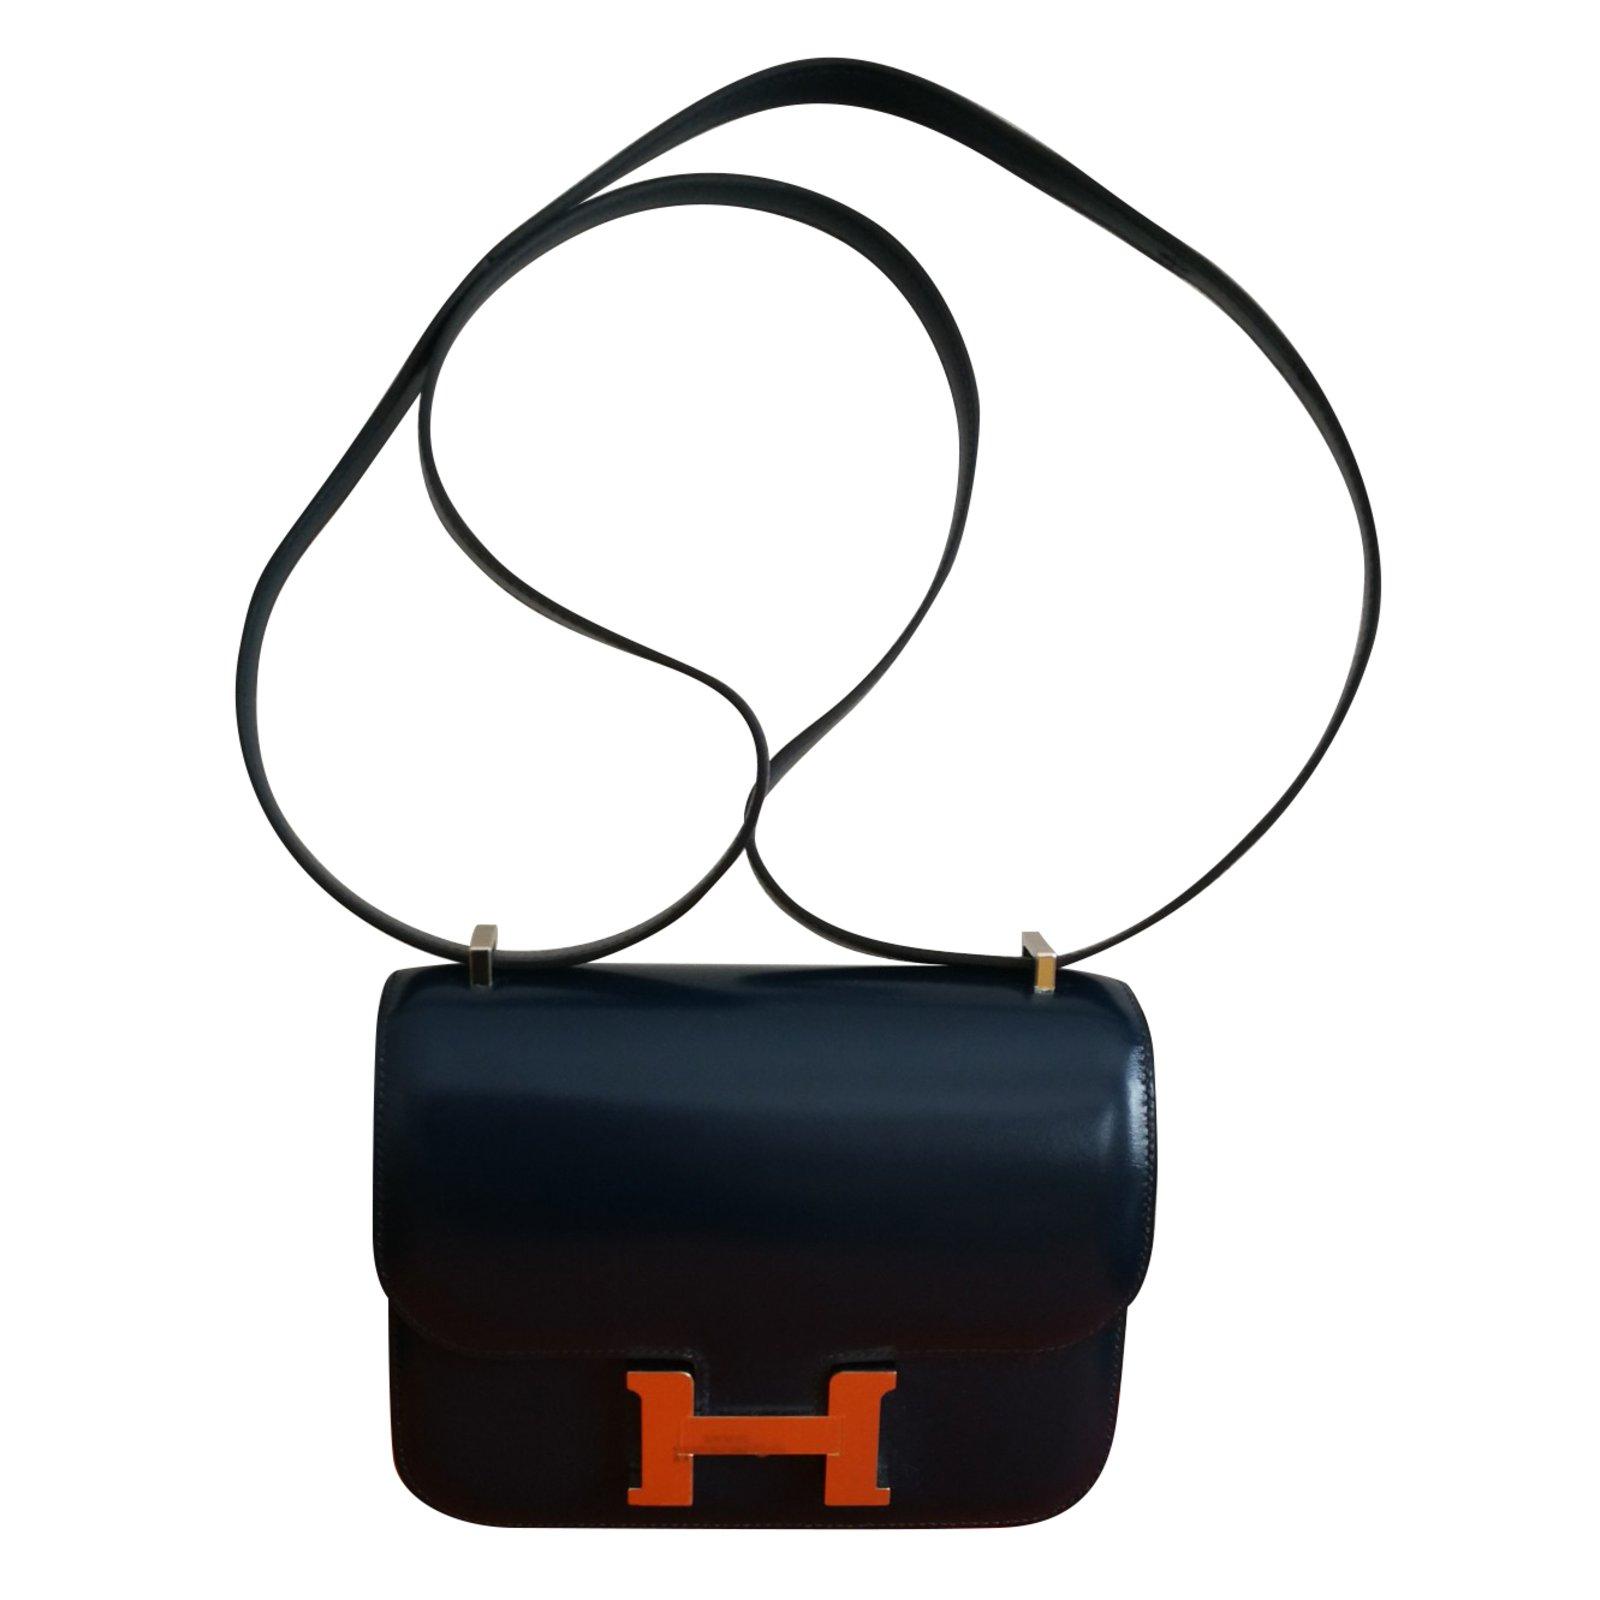 06bfcbbf93 Facebook · Pin This. Hermès Constance Mini Handbags Leather Navy blue ref .77775